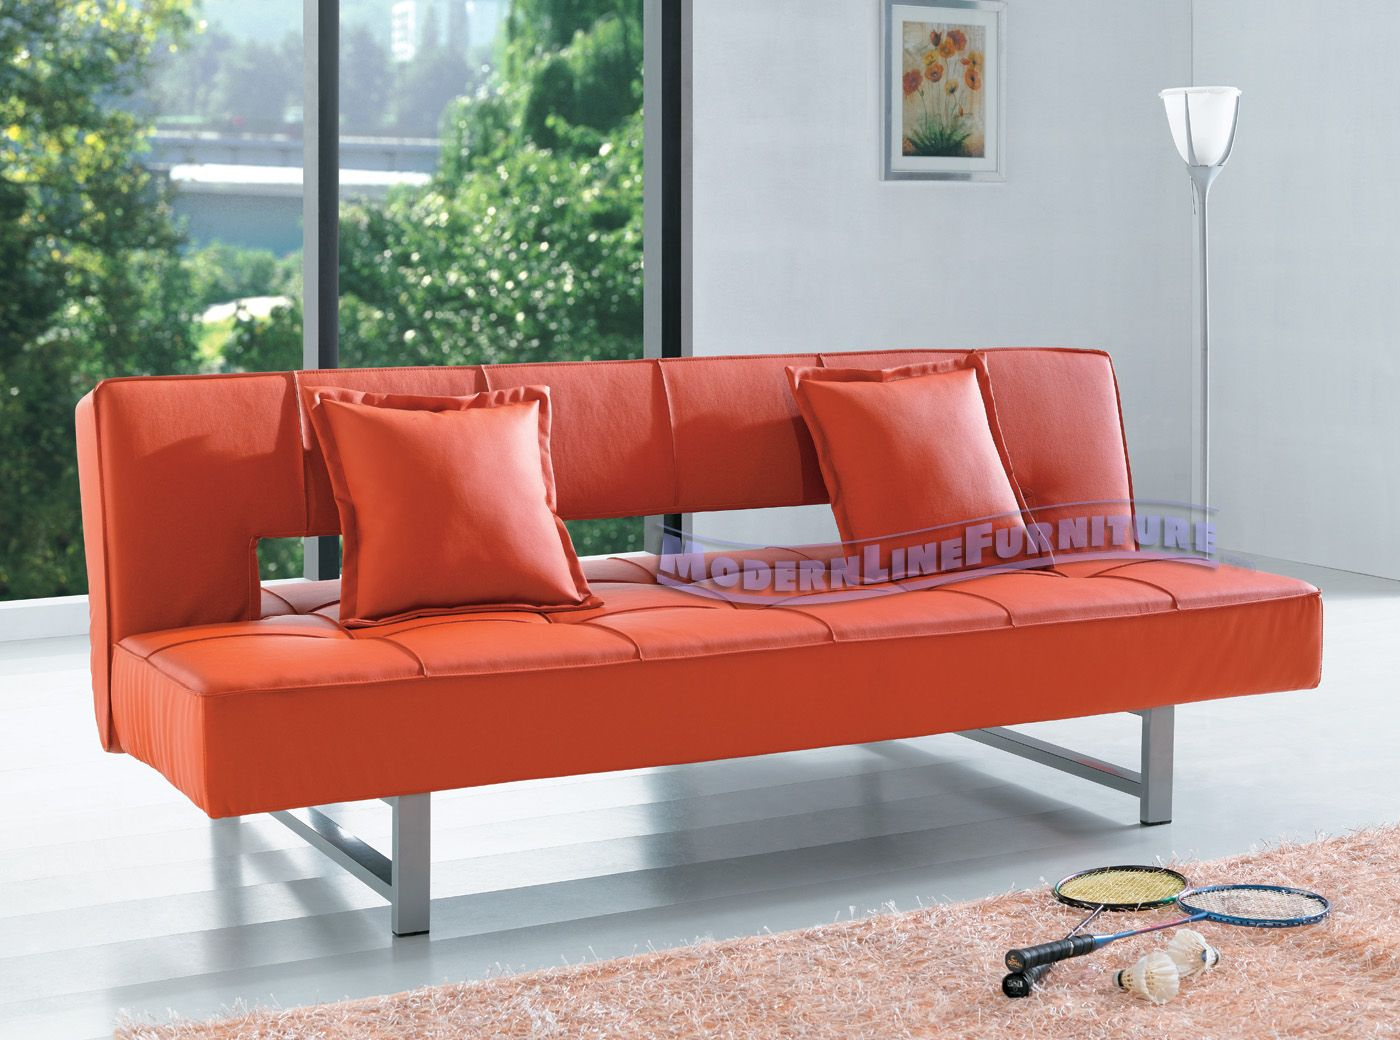 modern furniture  contemporary furniture  nightclub furniture  - modern furniture  contemporary furniture  nightclub furniture  designerfurniture  clearance modern pumpkin